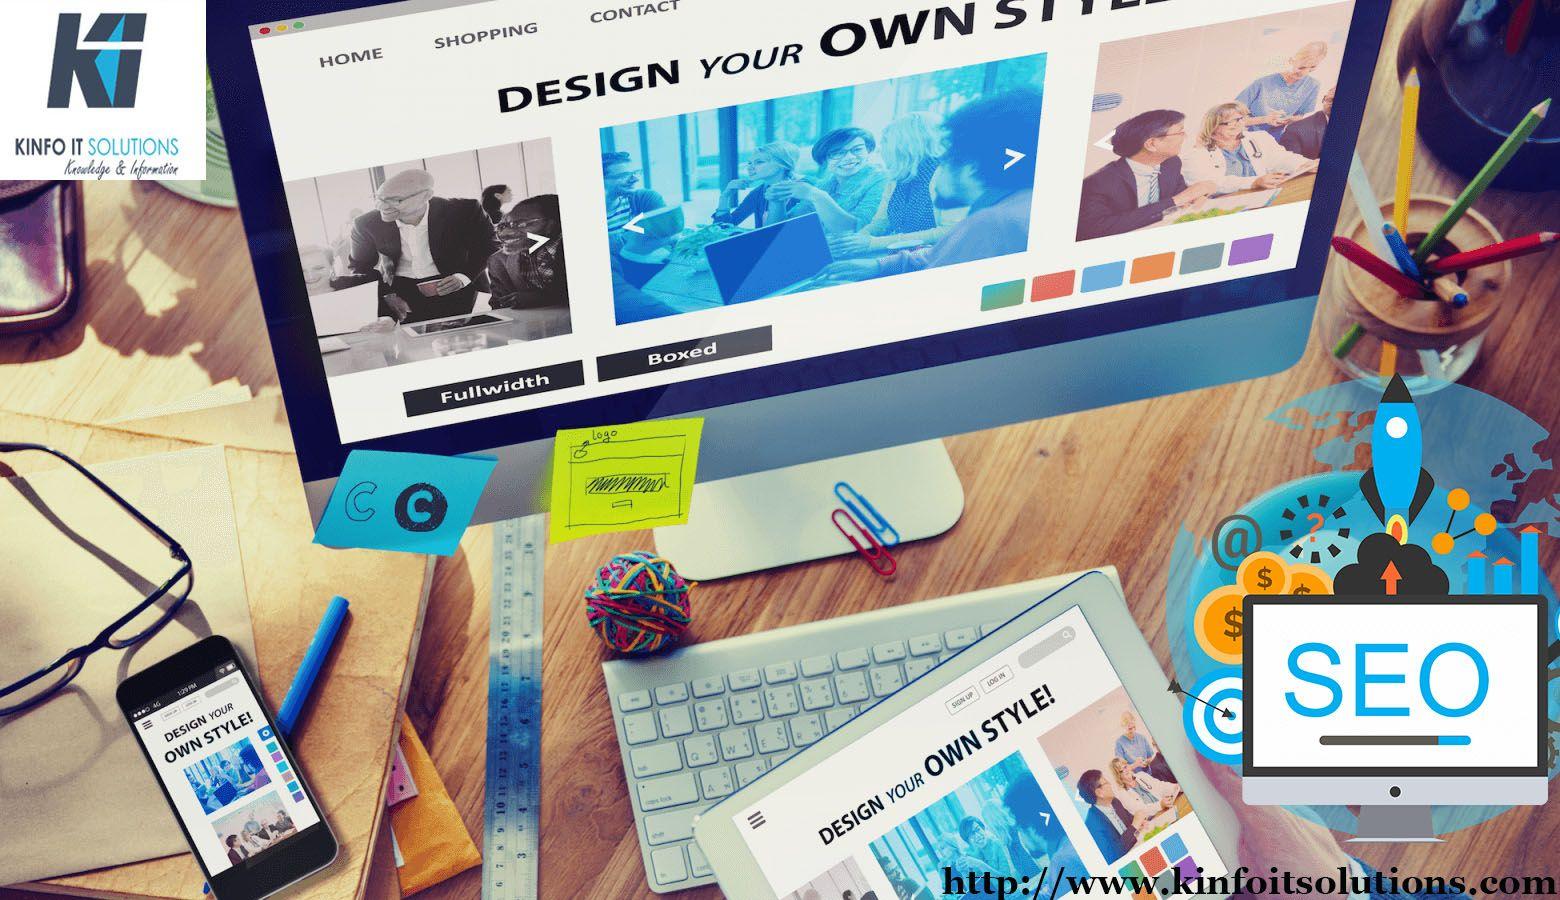 Software Development Company Web Application Development Company Web Development Design Website Design Company Web Design Tips